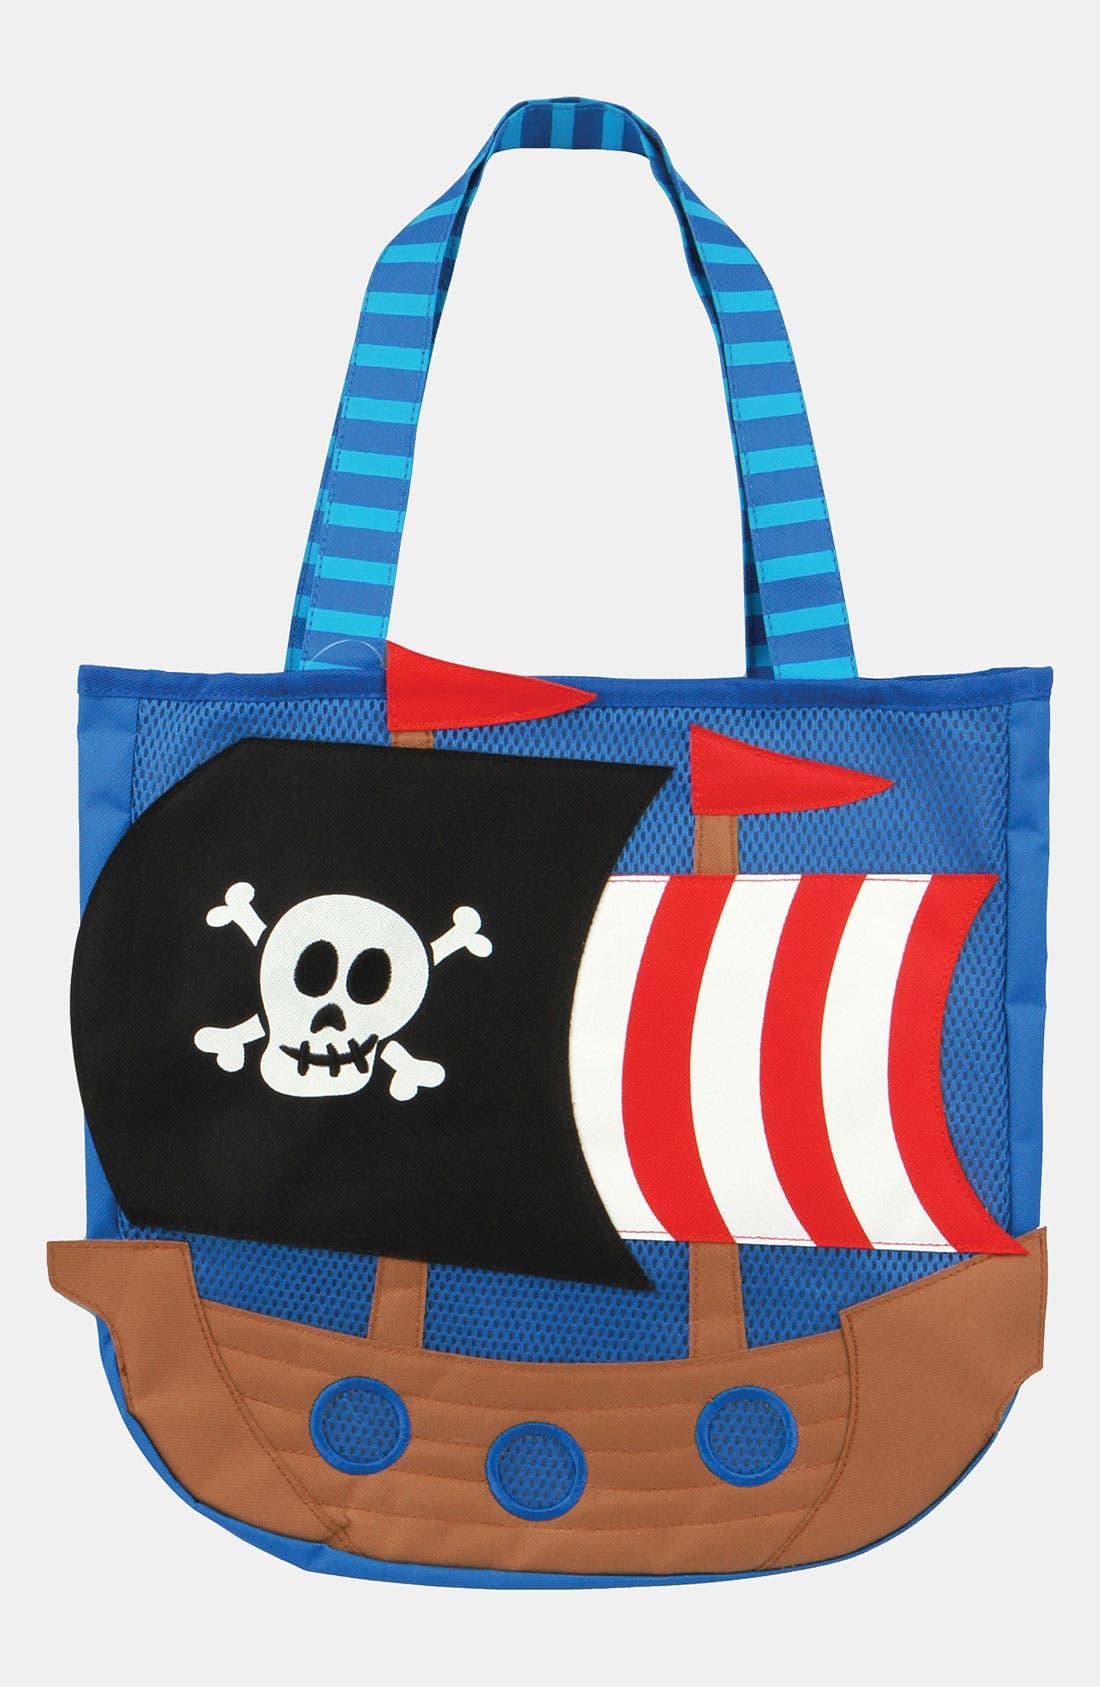 Alternate Image 1 Selected - Stephen Joseph 'Pirate' Beach Tote & Toys